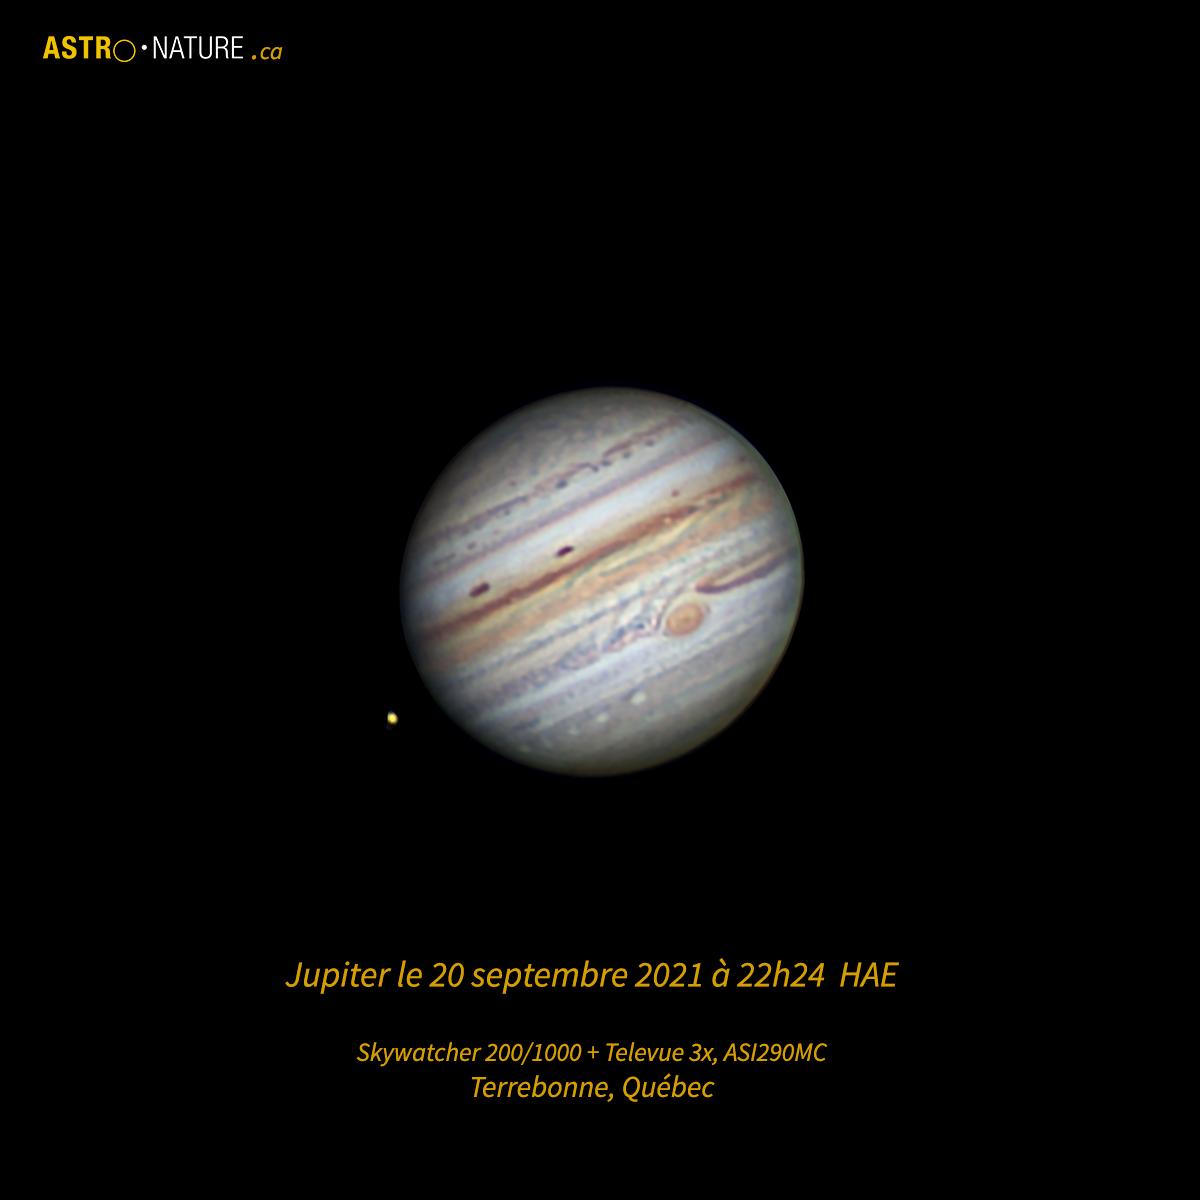 2021-09-20-0224JupiterVER1.png.f4b599633cfa3c3ebb2f8c2251faa6ca.png